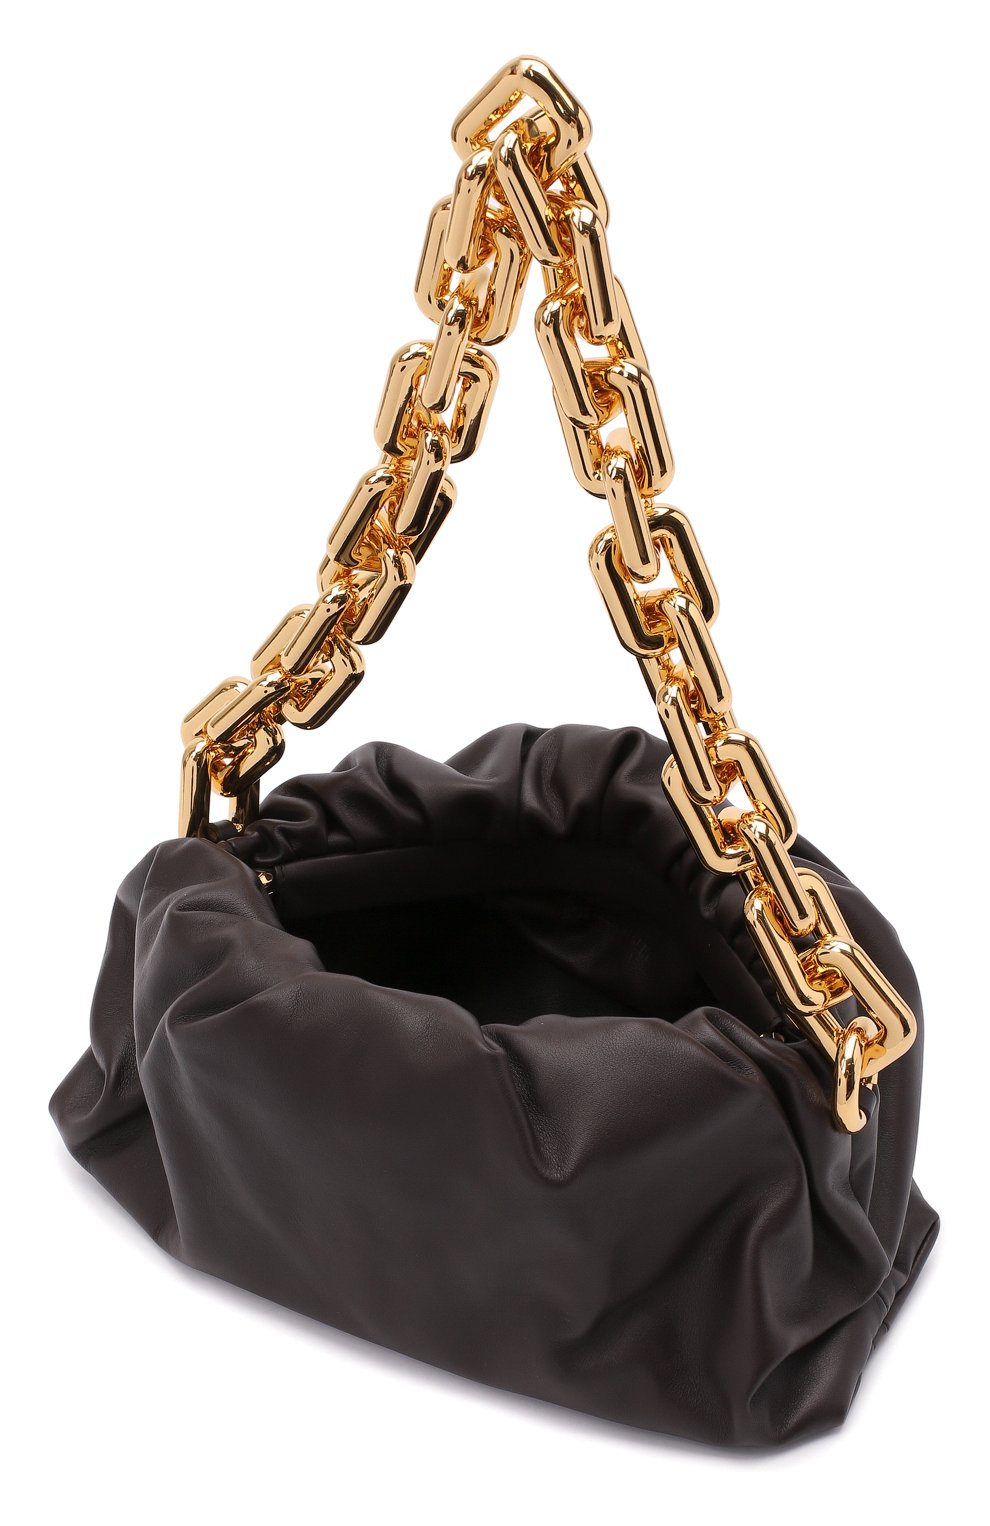 Женская сумка chain pouch BOTTEGA VENETA темно-коричневого цвета, арт. 620230/VCP40   Фото 5